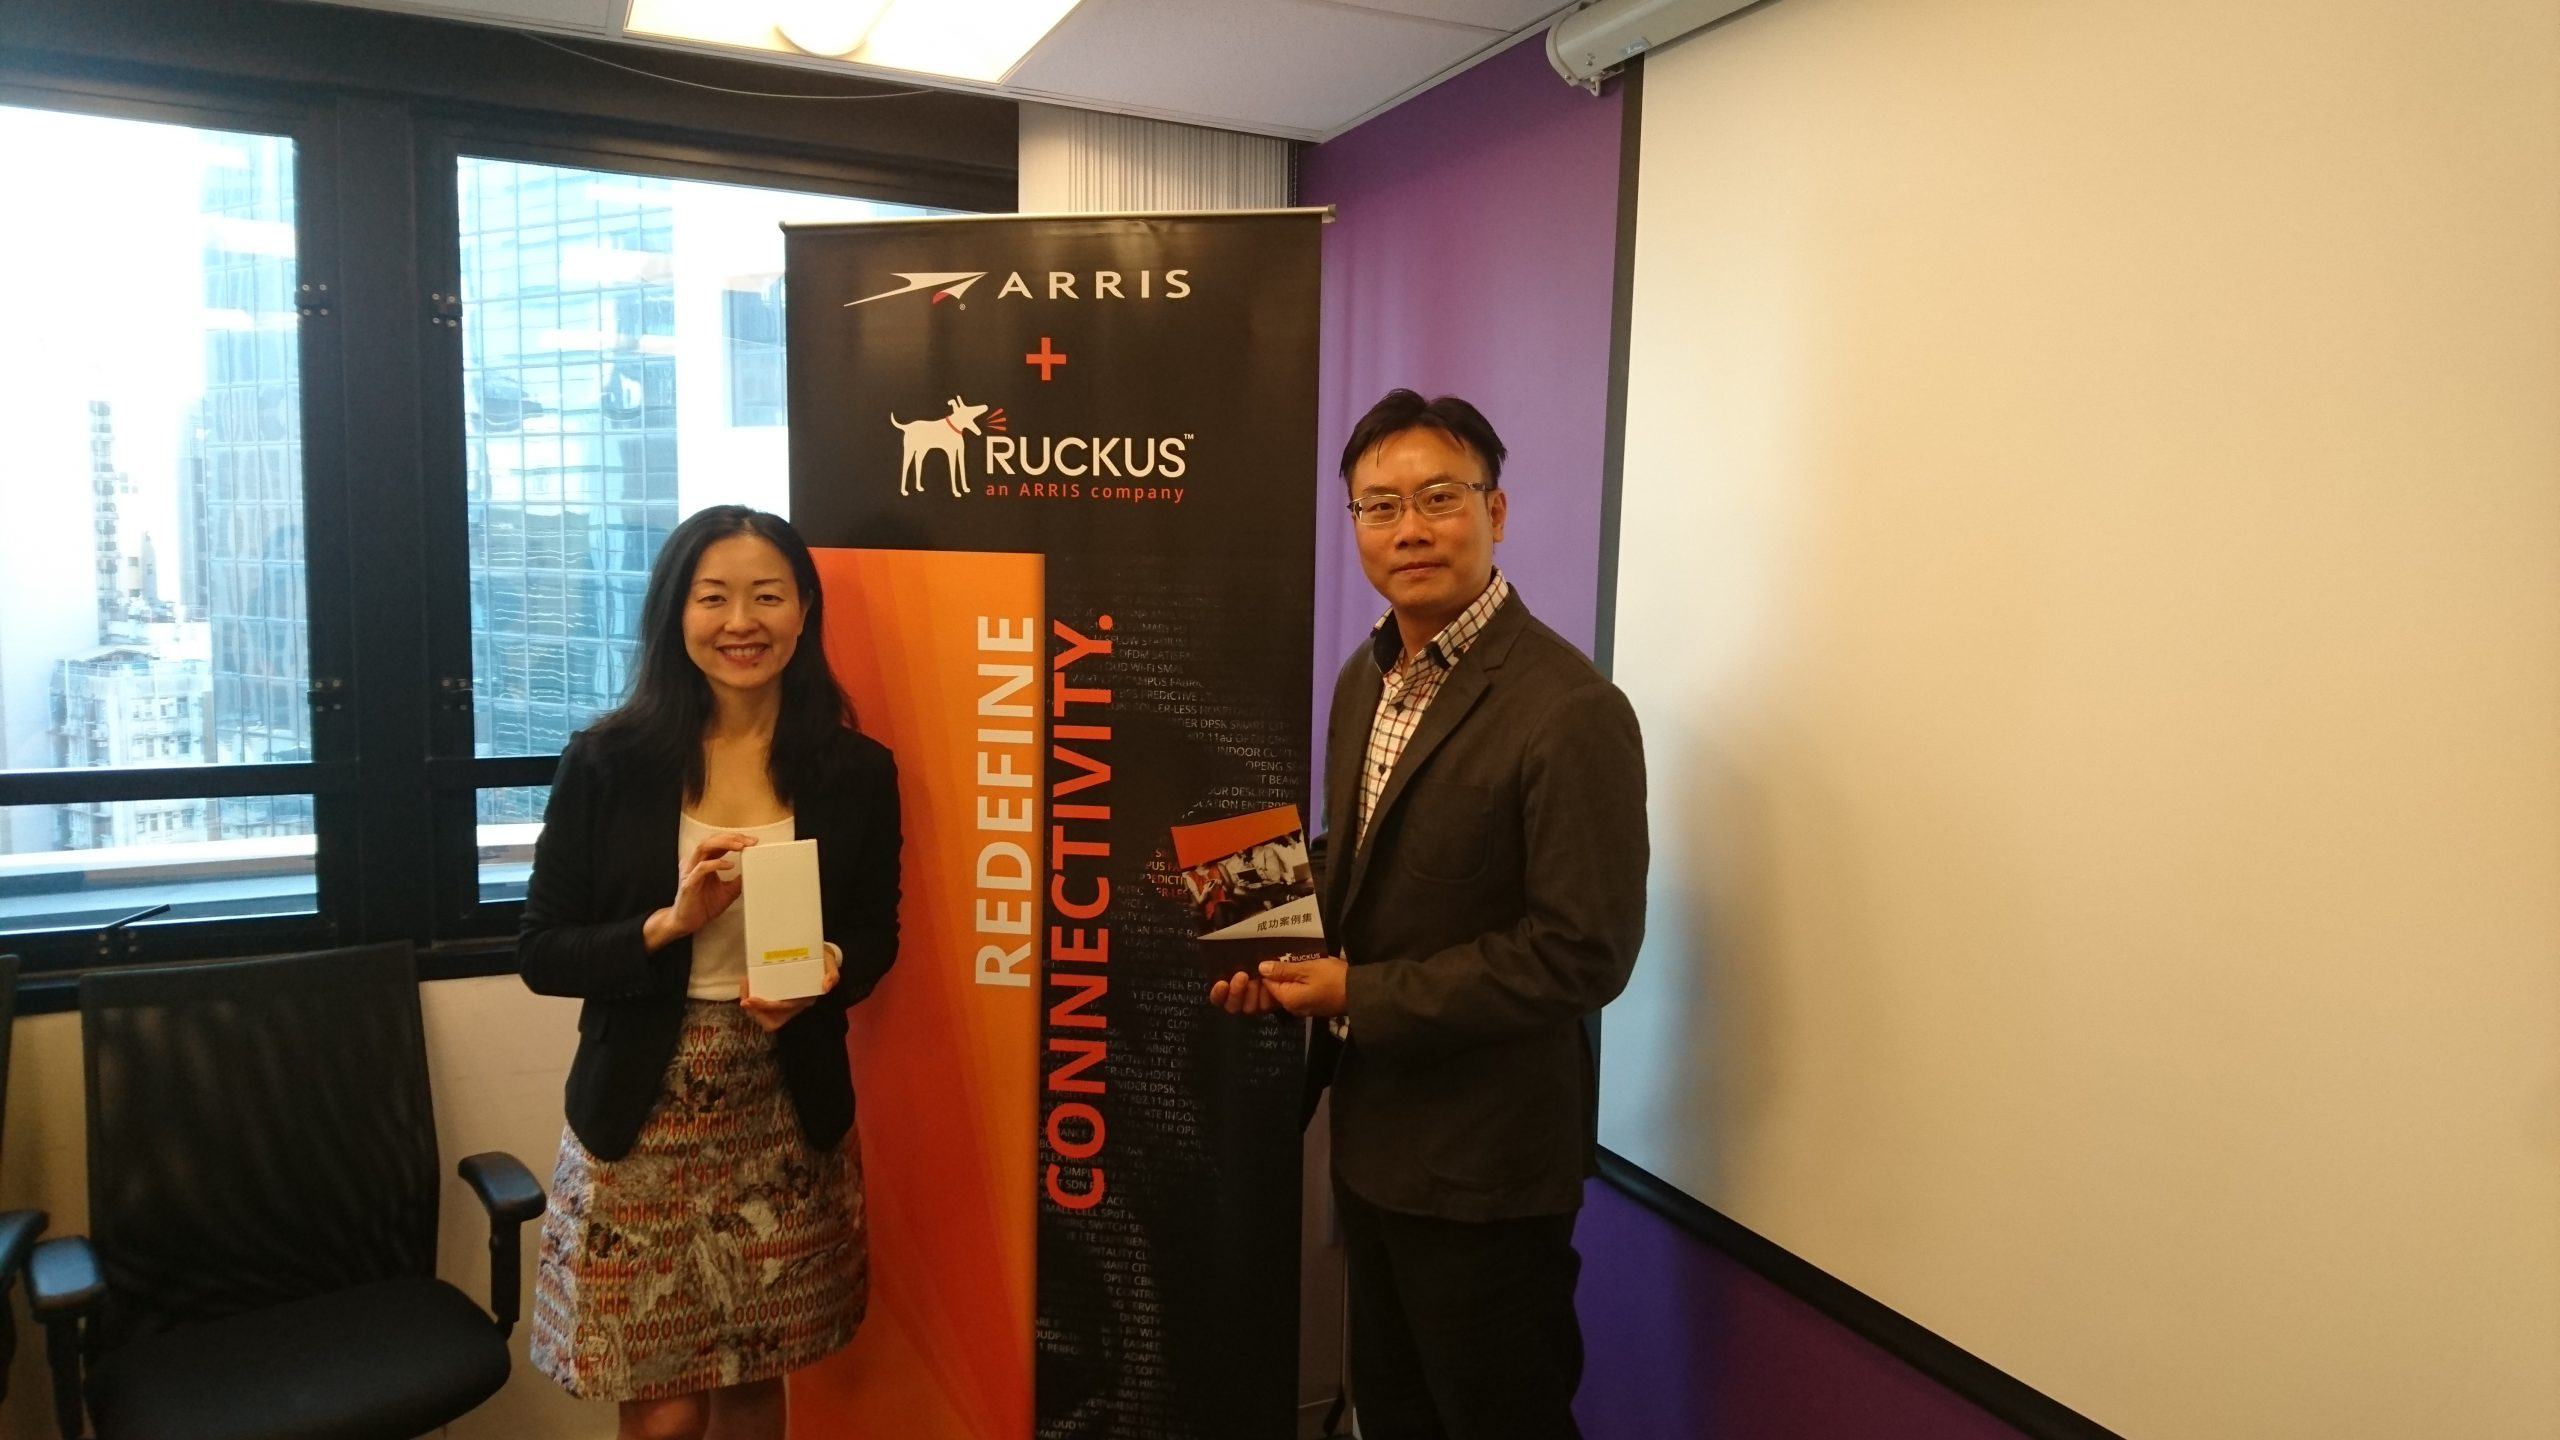 Ruckus Networks 台灣與香港總經理許慧嫻(左)及Ruckus Networks 台灣與香港技術經理李棟楠(右)